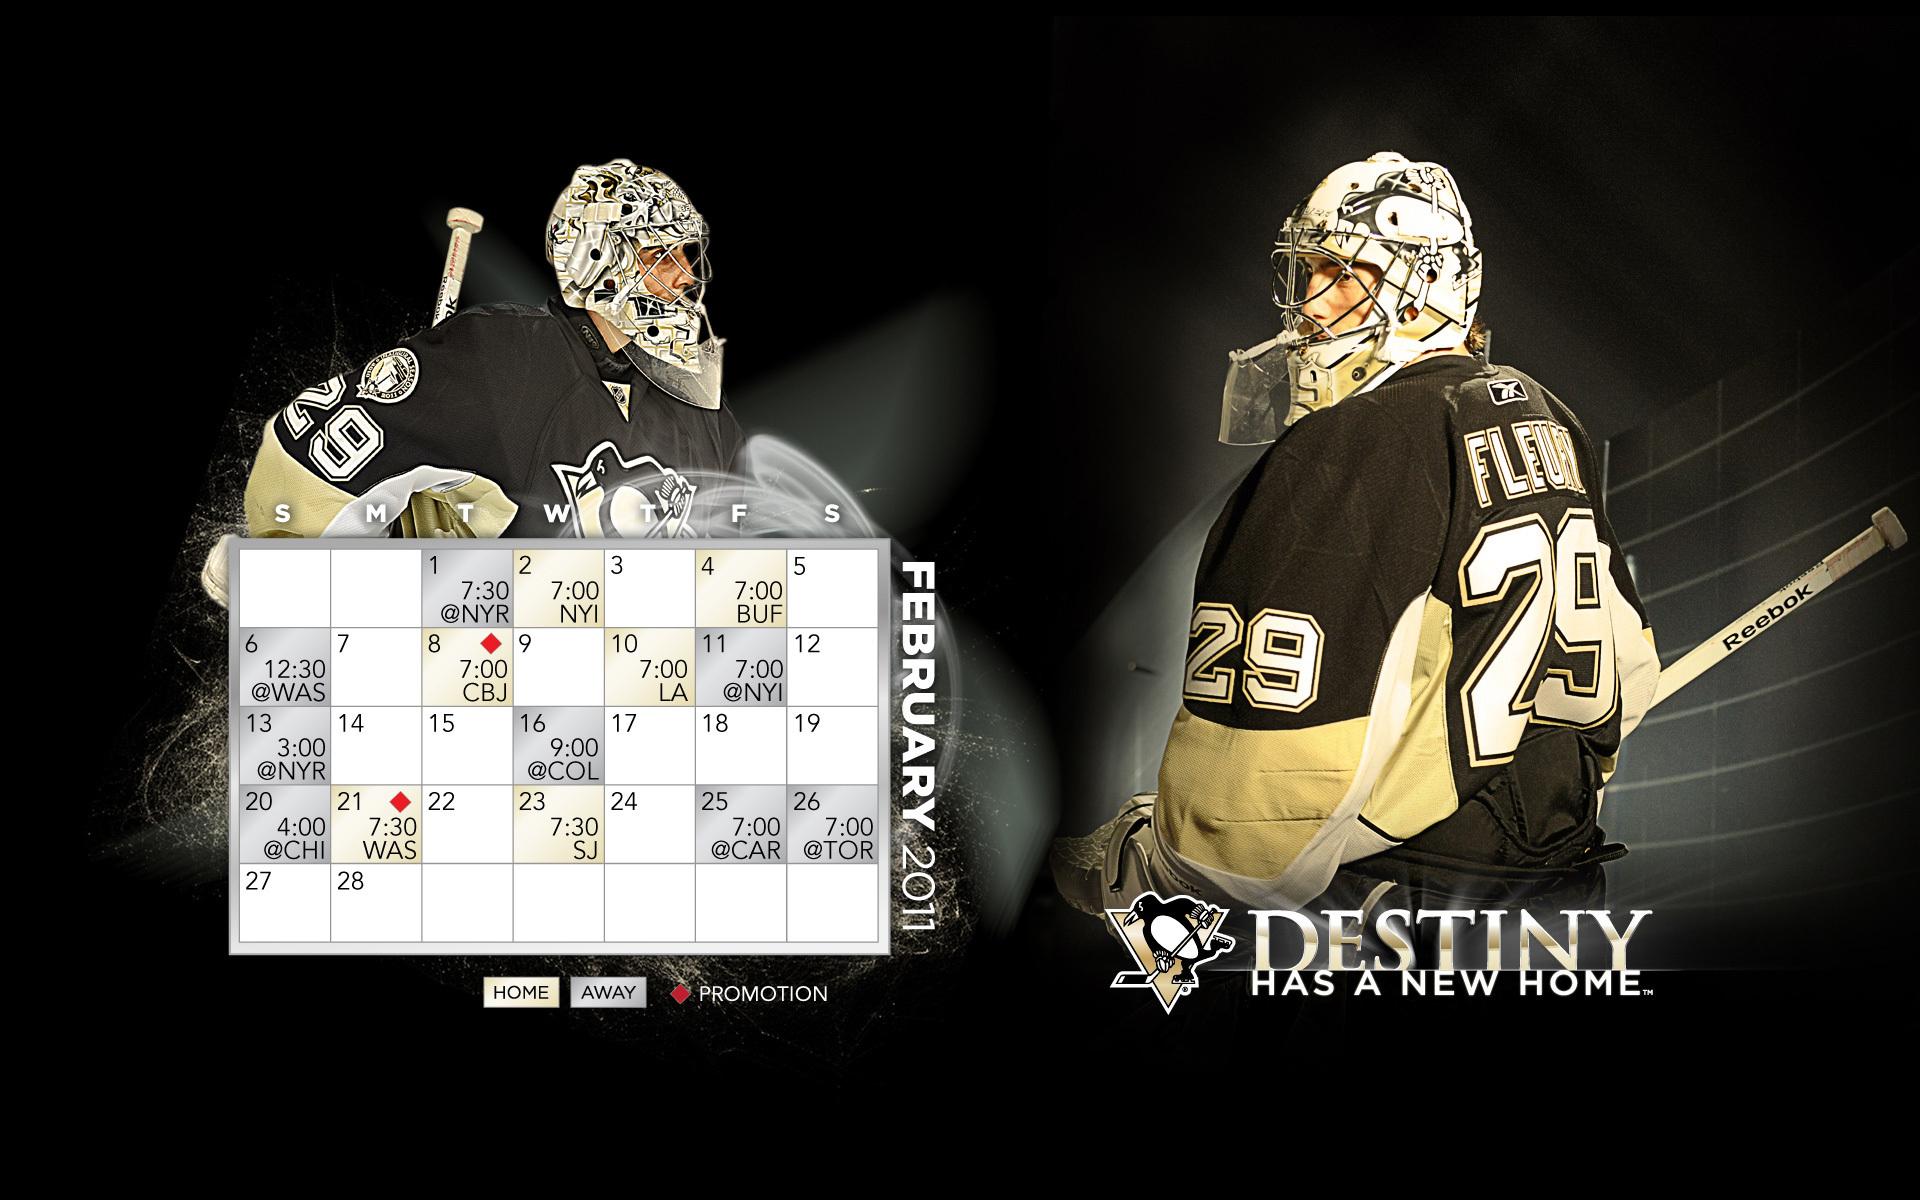 February 2011 CalendarSchedule   Marc Andre Fleury Wallpaper 1920x1200